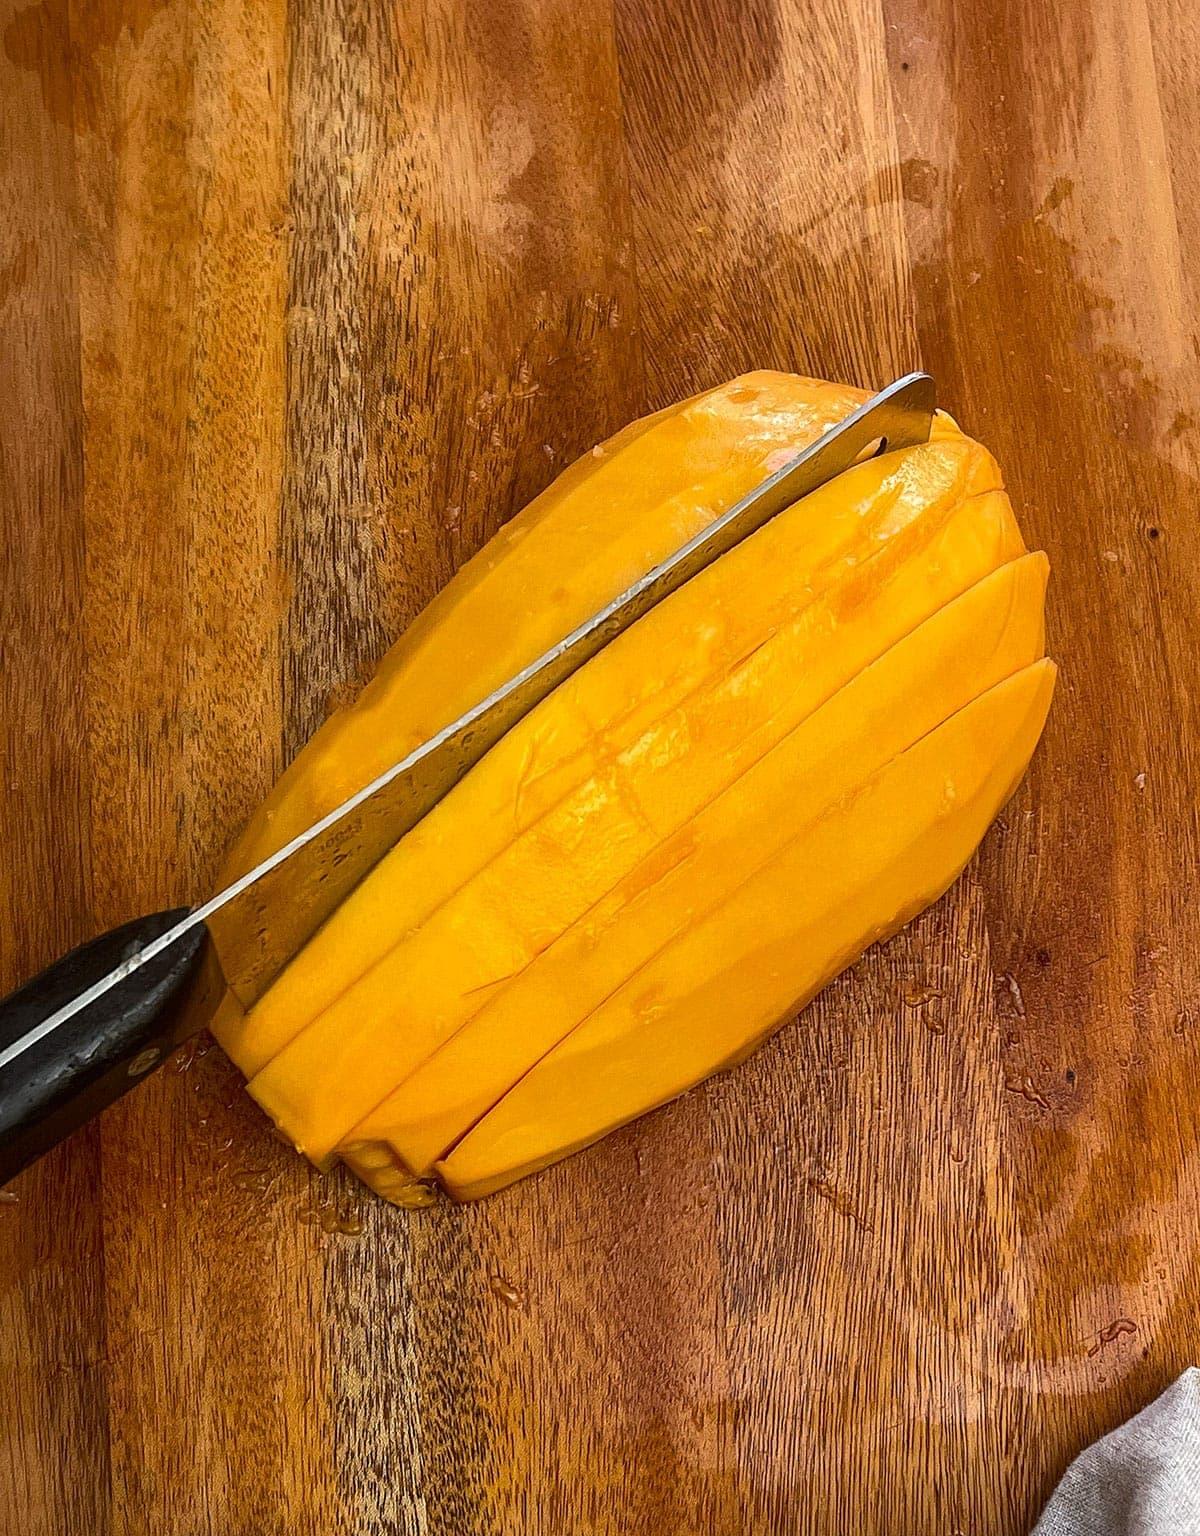 Papaya cut into spears